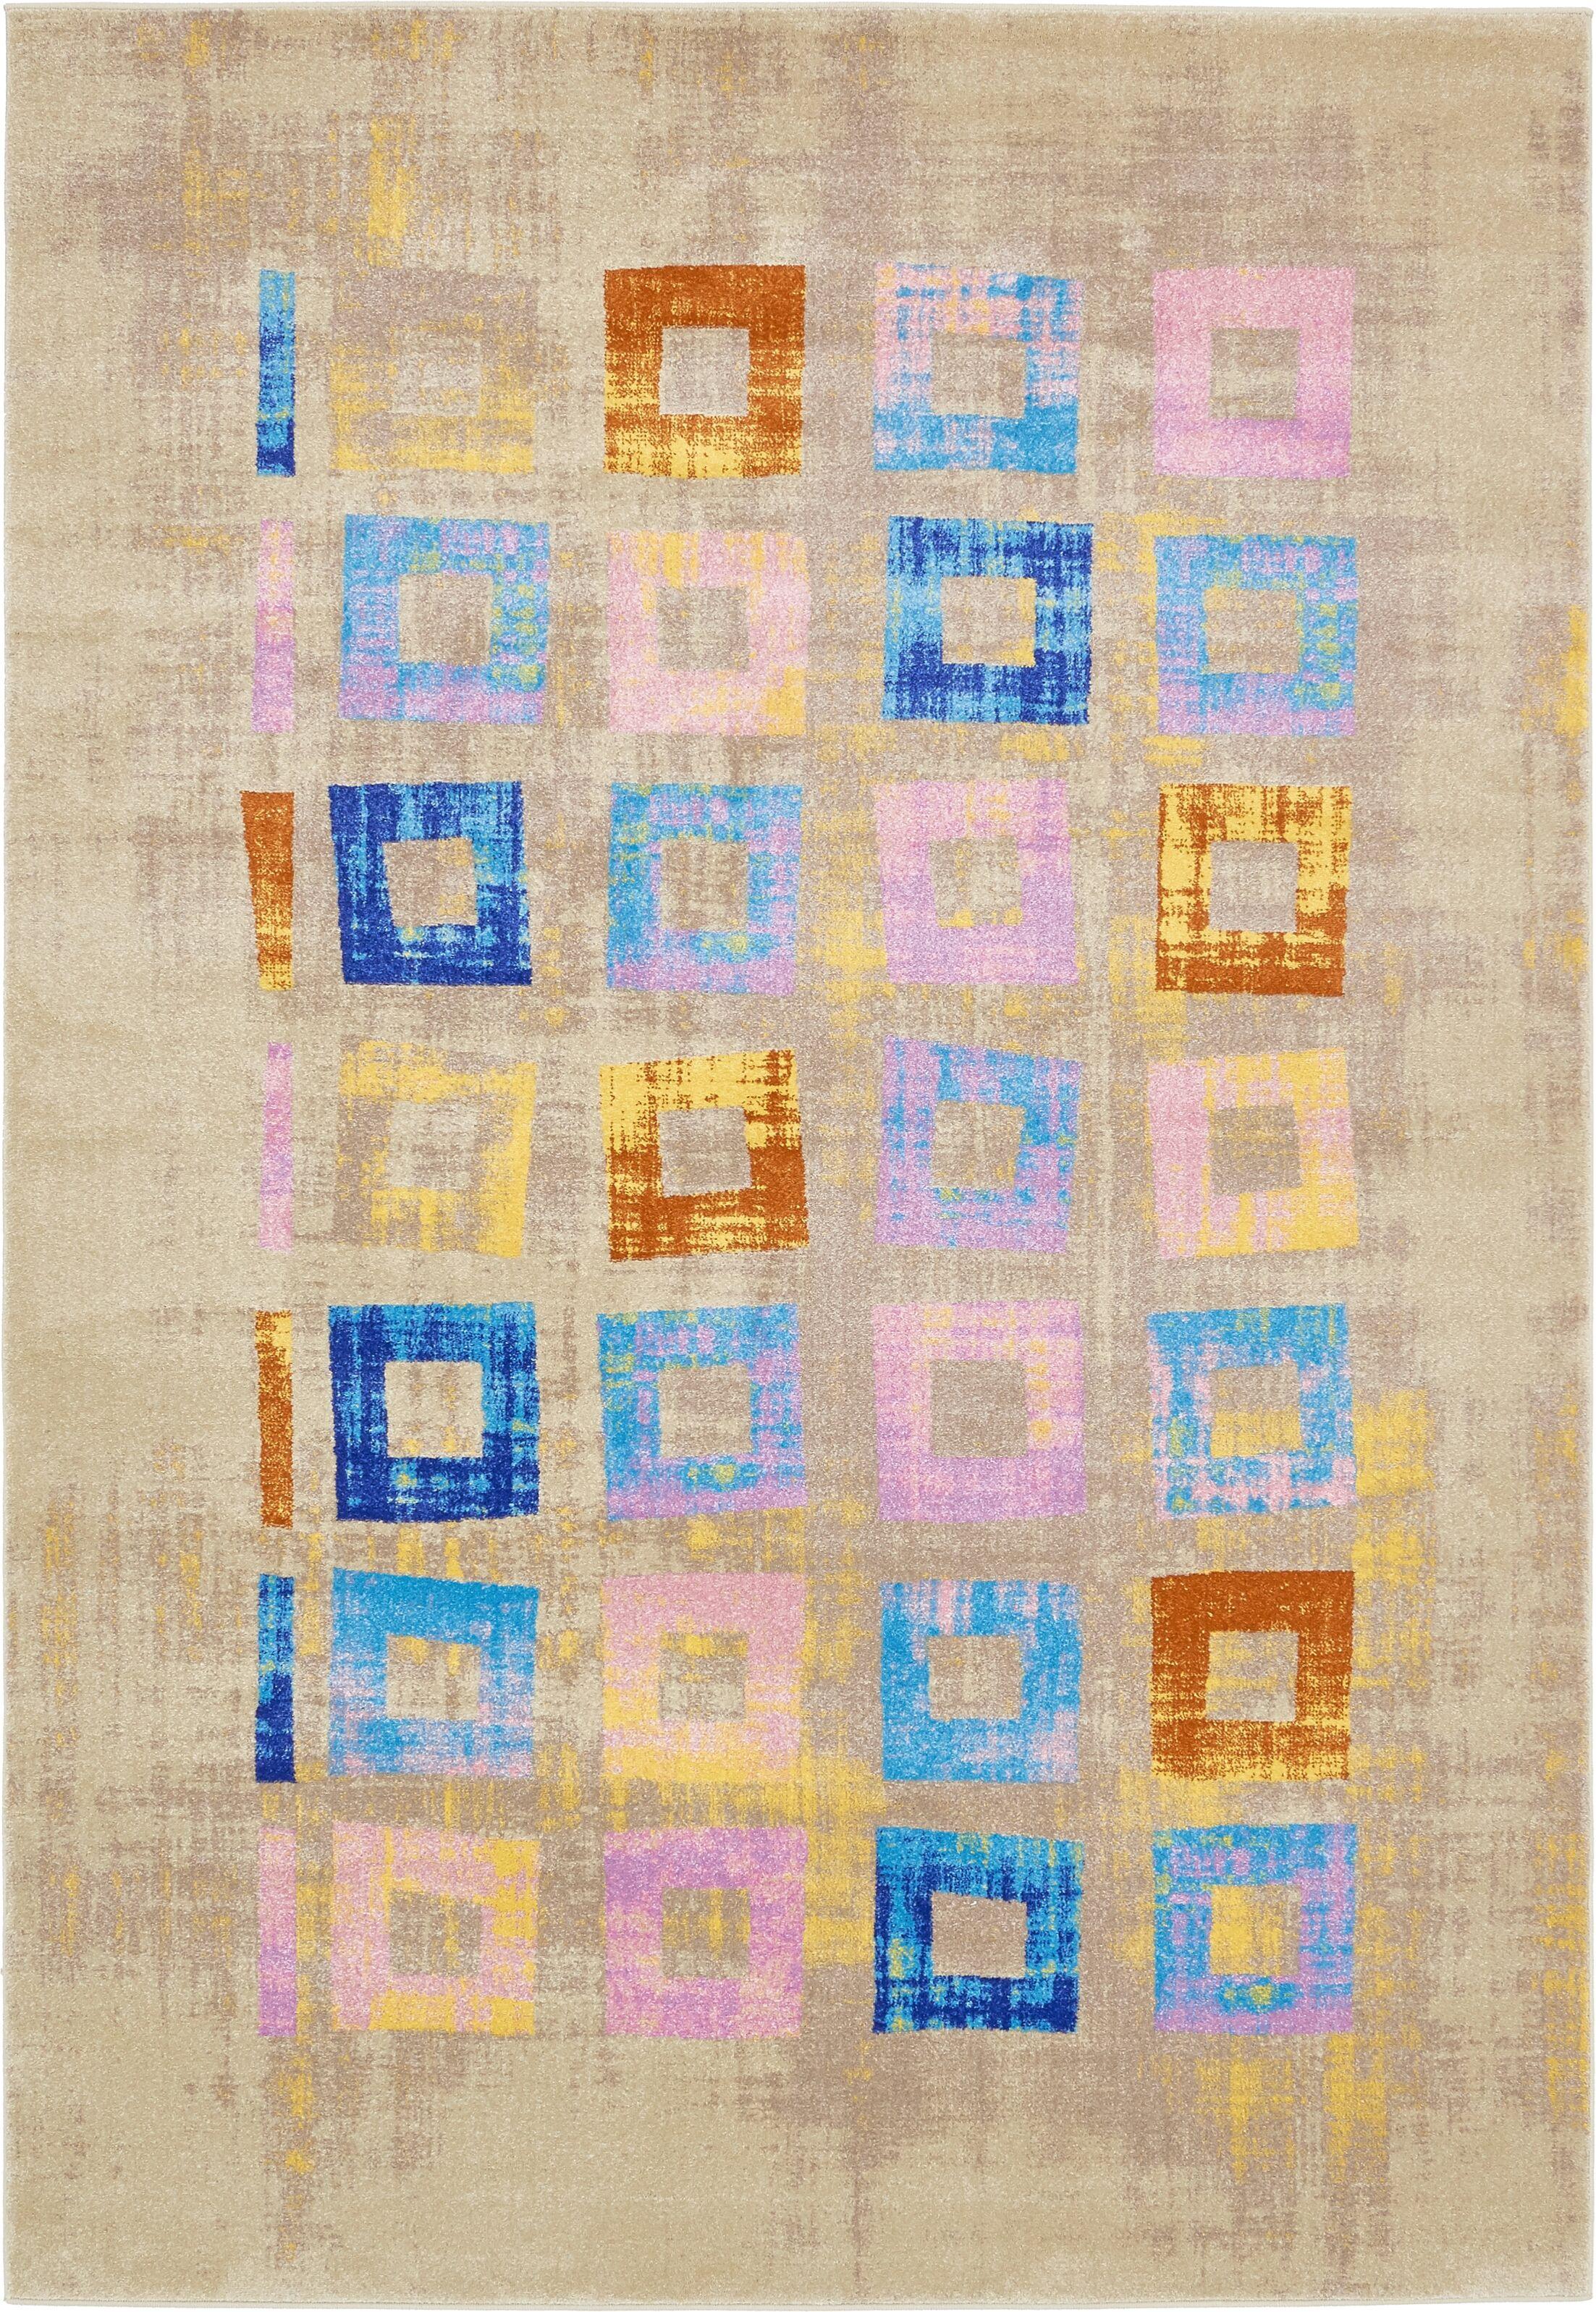 Annisville Beige/Blue Area Rug Rug Size: Rectangle 7' x 10'